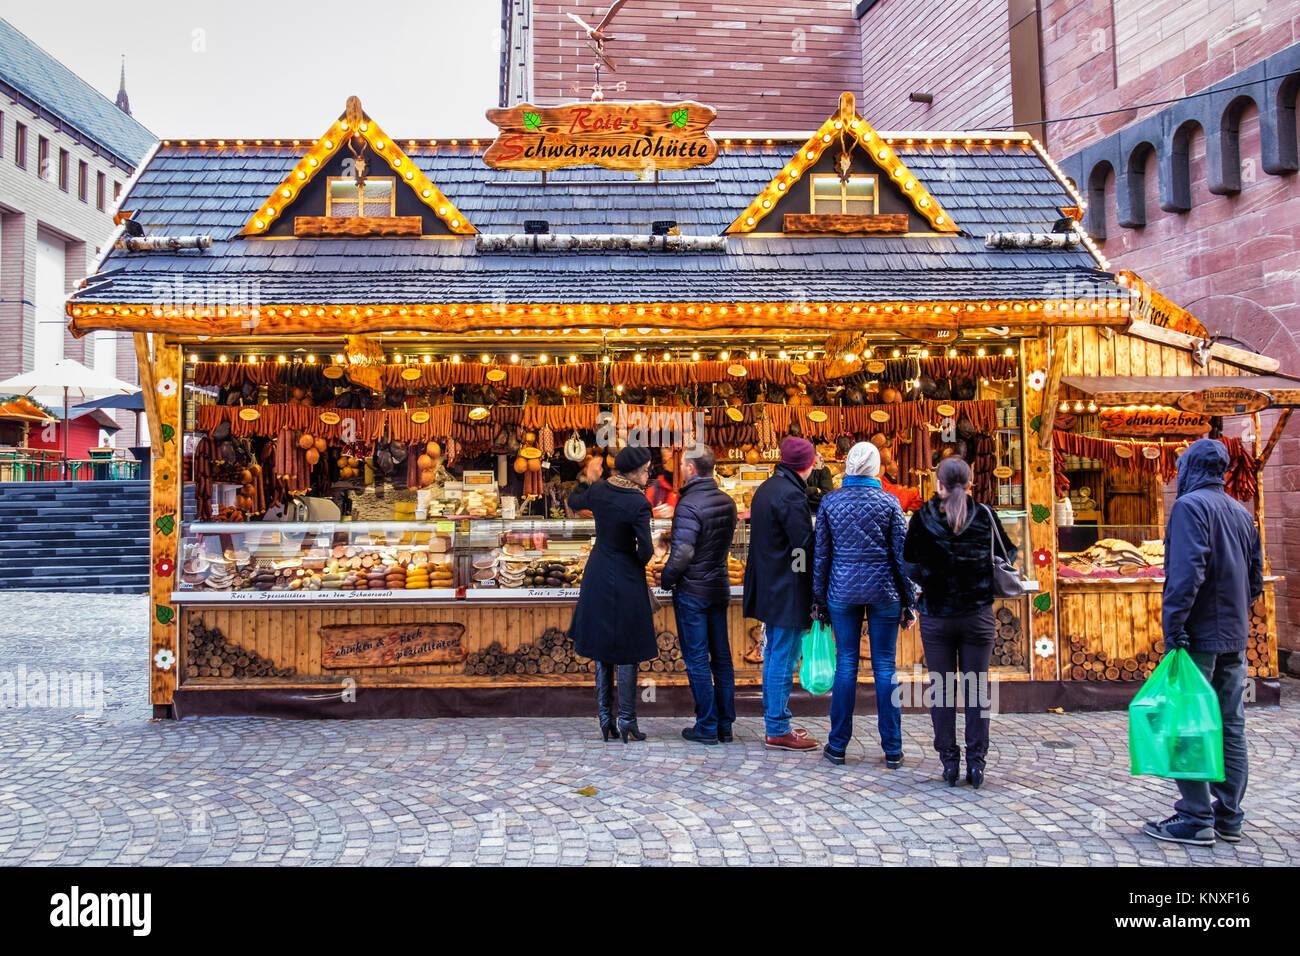 Frankfurt,Germany. Traditional German Market stall on Römerberg  selling sausages and German food delicacies - Stock Image